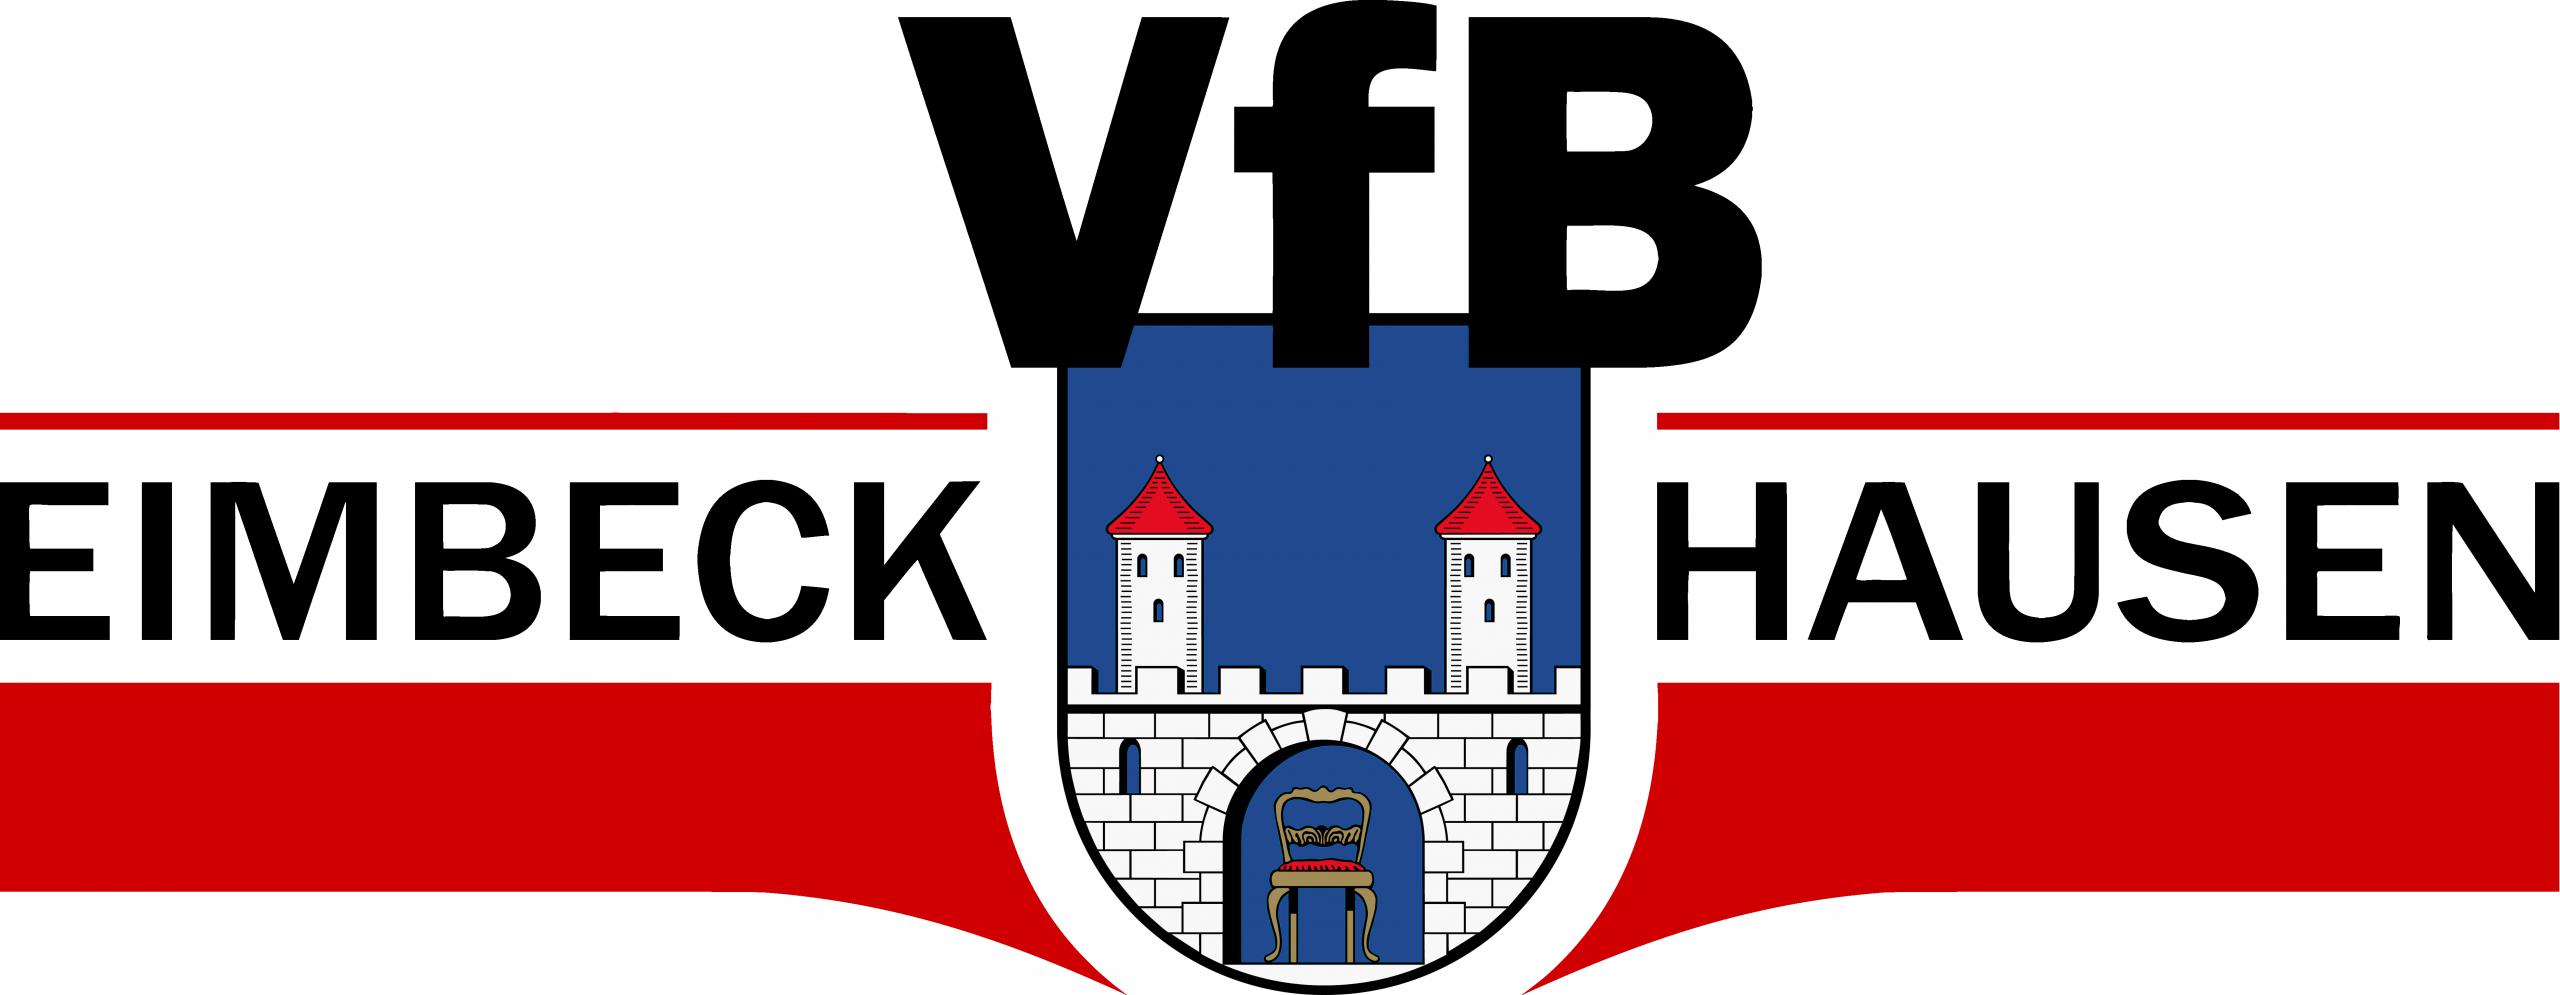 VfB Eimbeckhausen